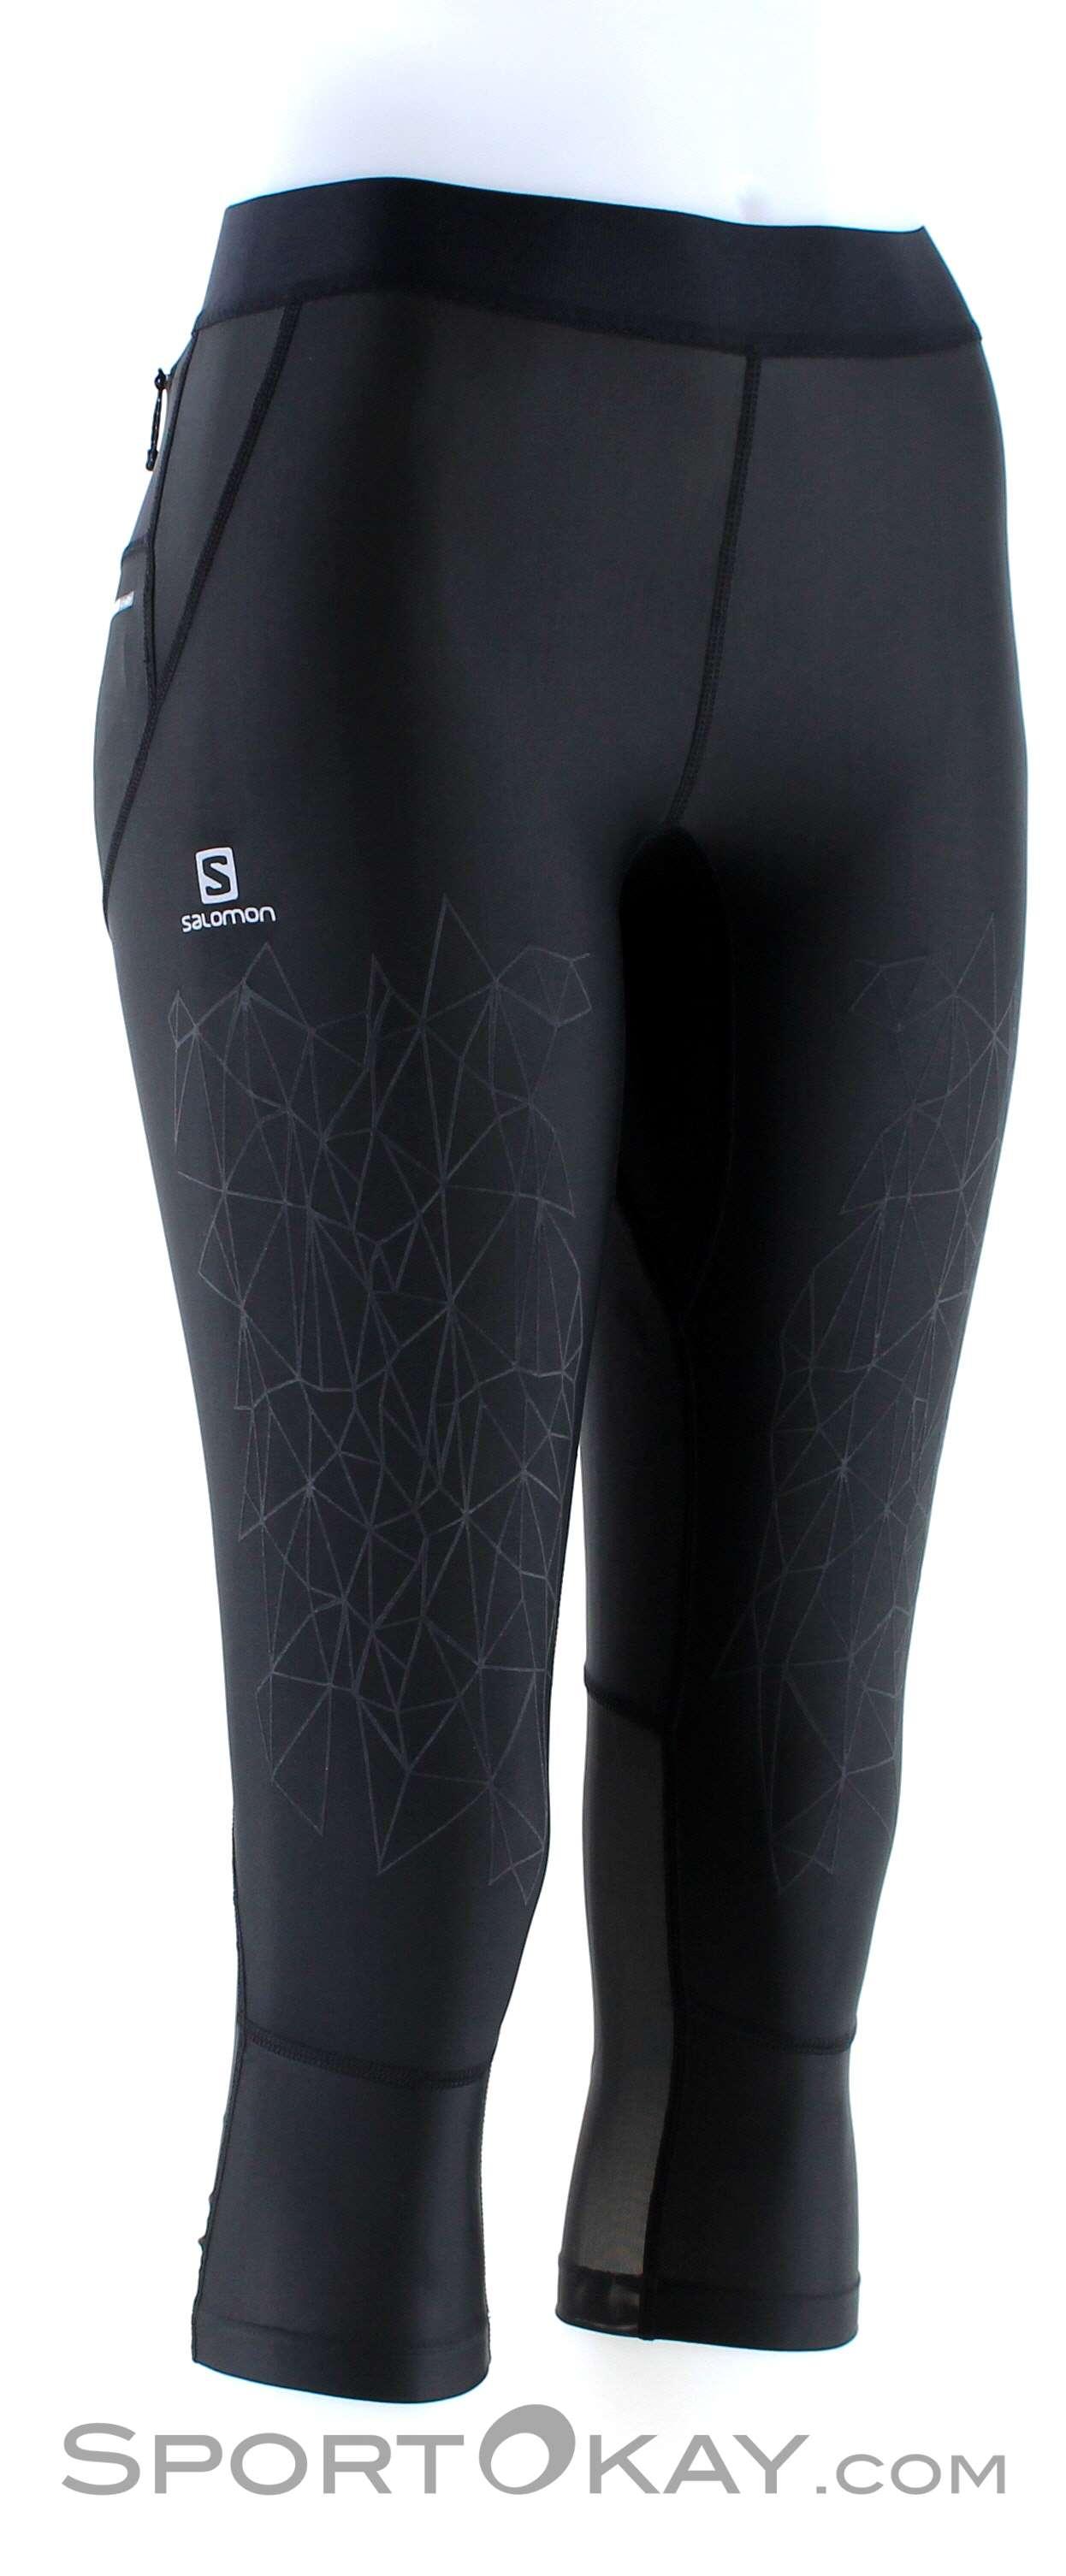 Salomon Intensity Mid Tight Laufhose Damen online kaufen